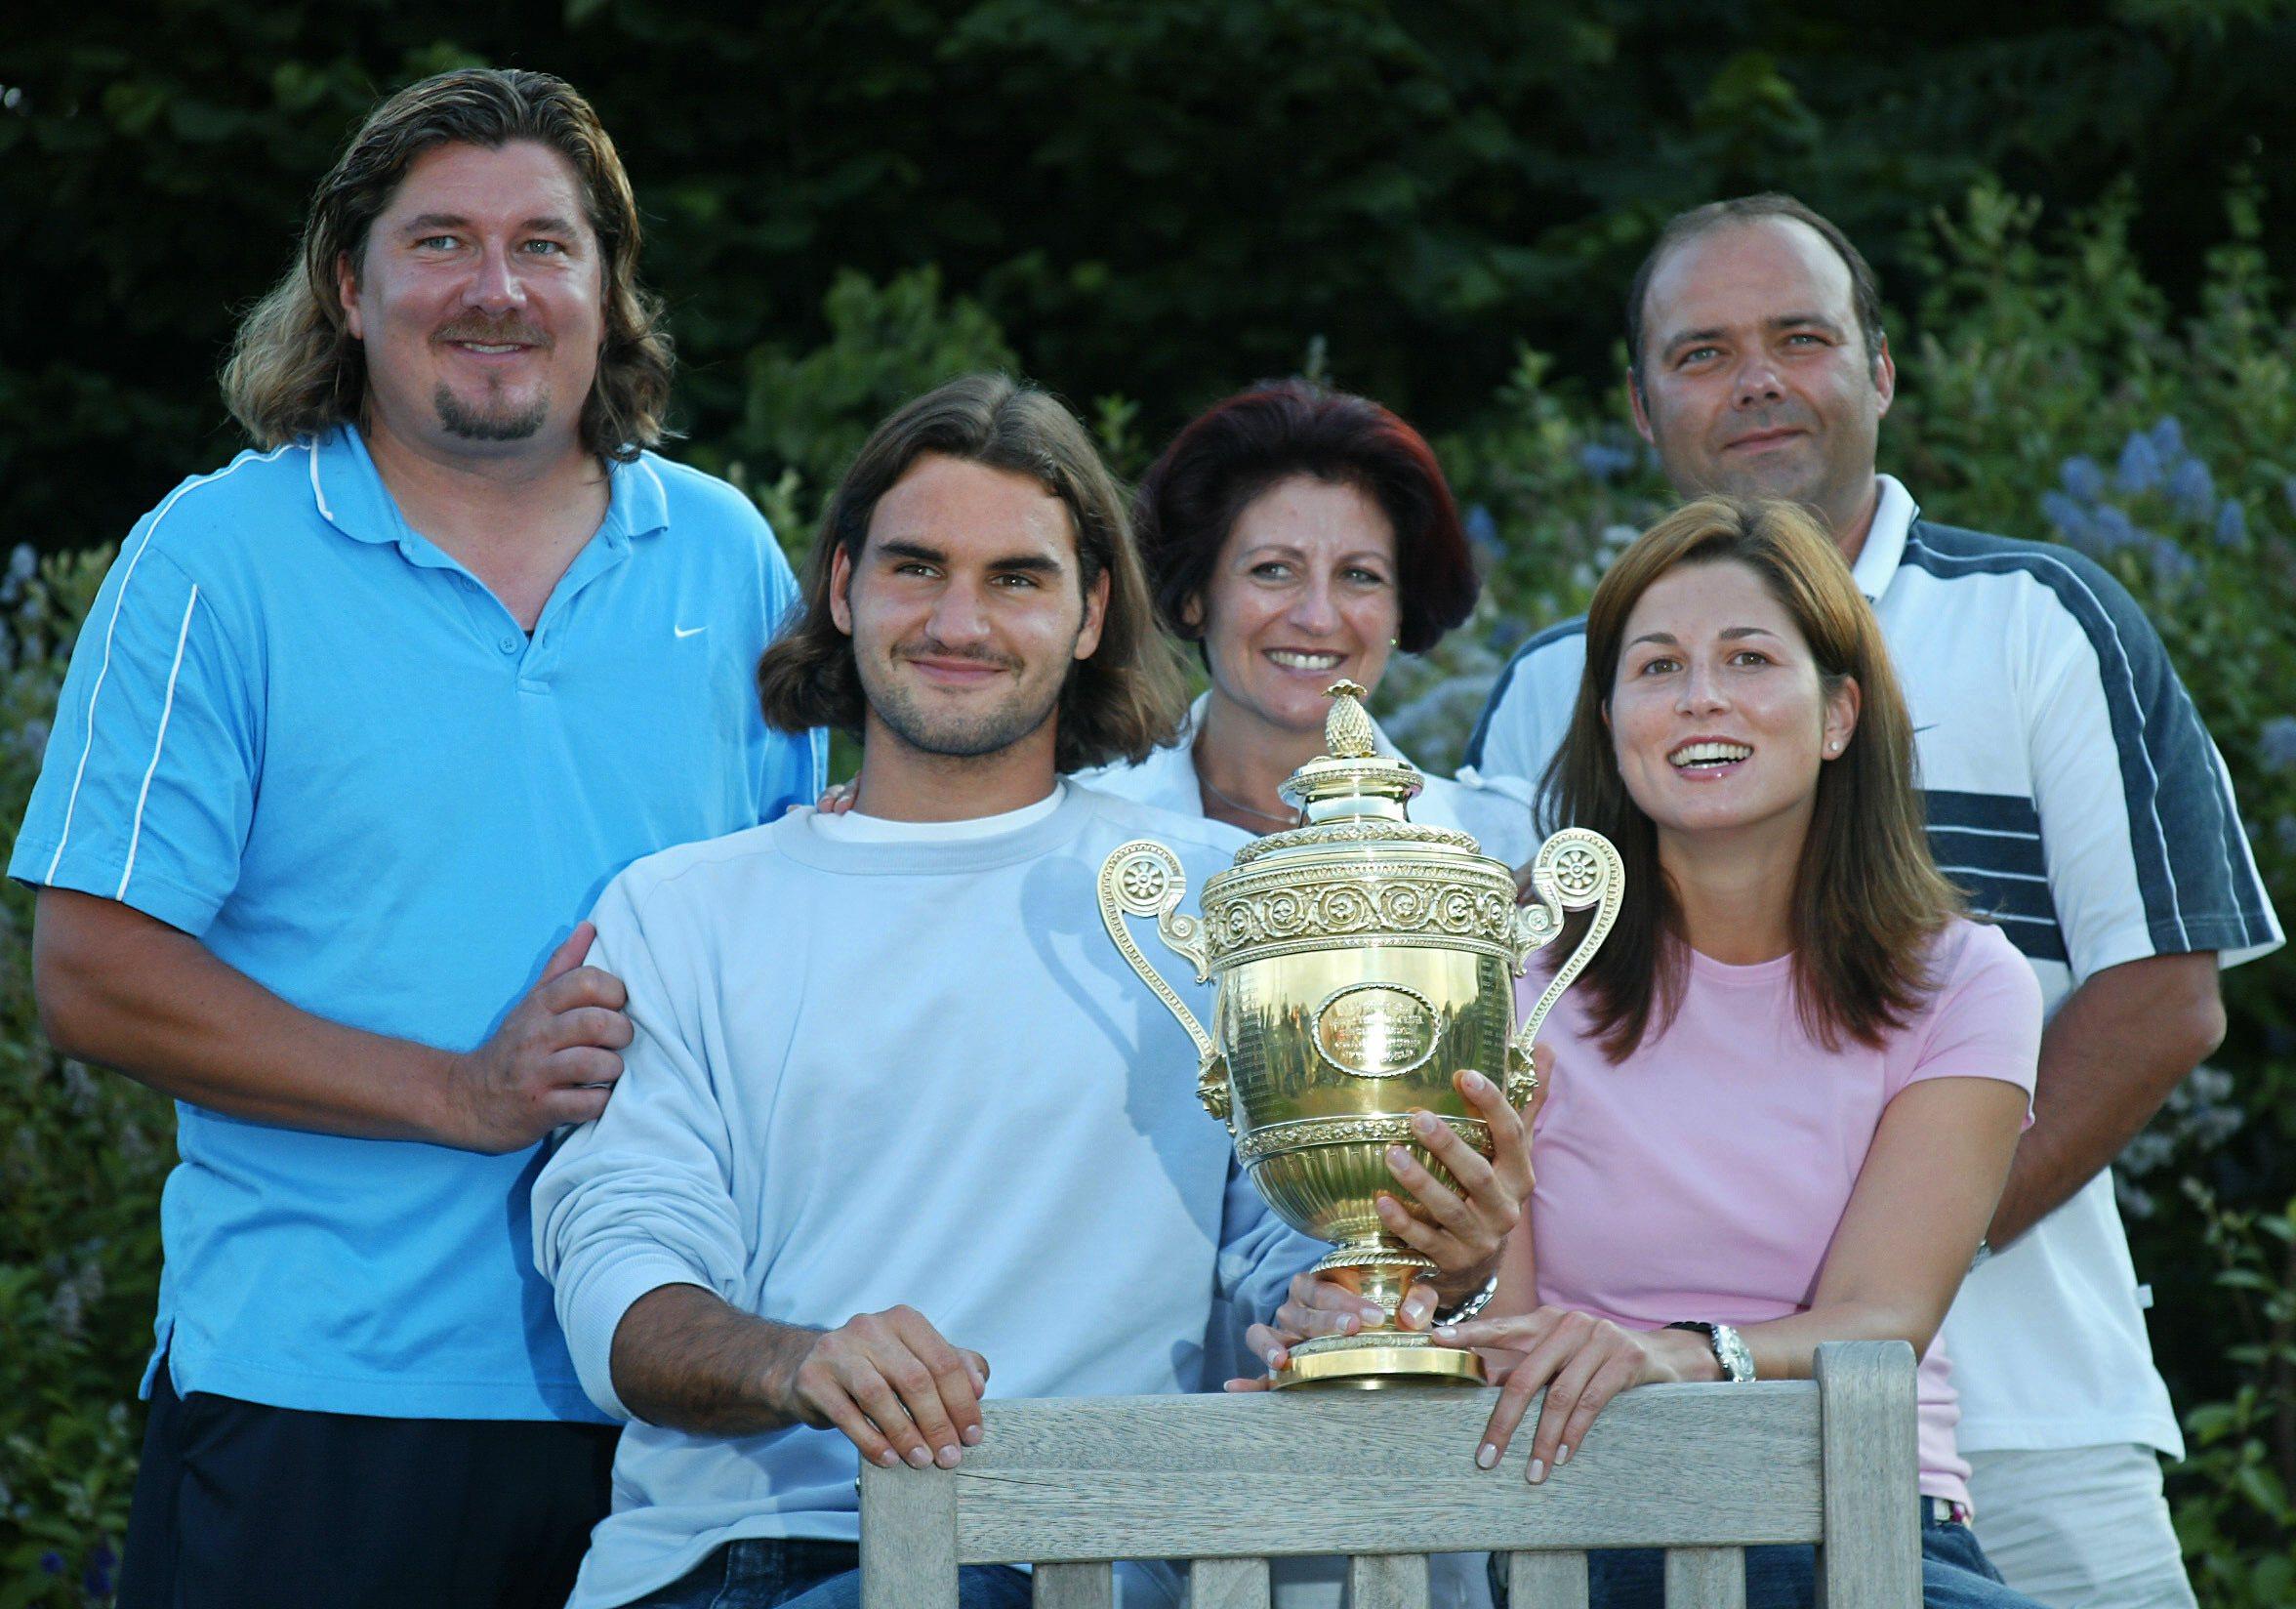 Peter Lundgren: Młody Federer był utalentowany, ale leniwy